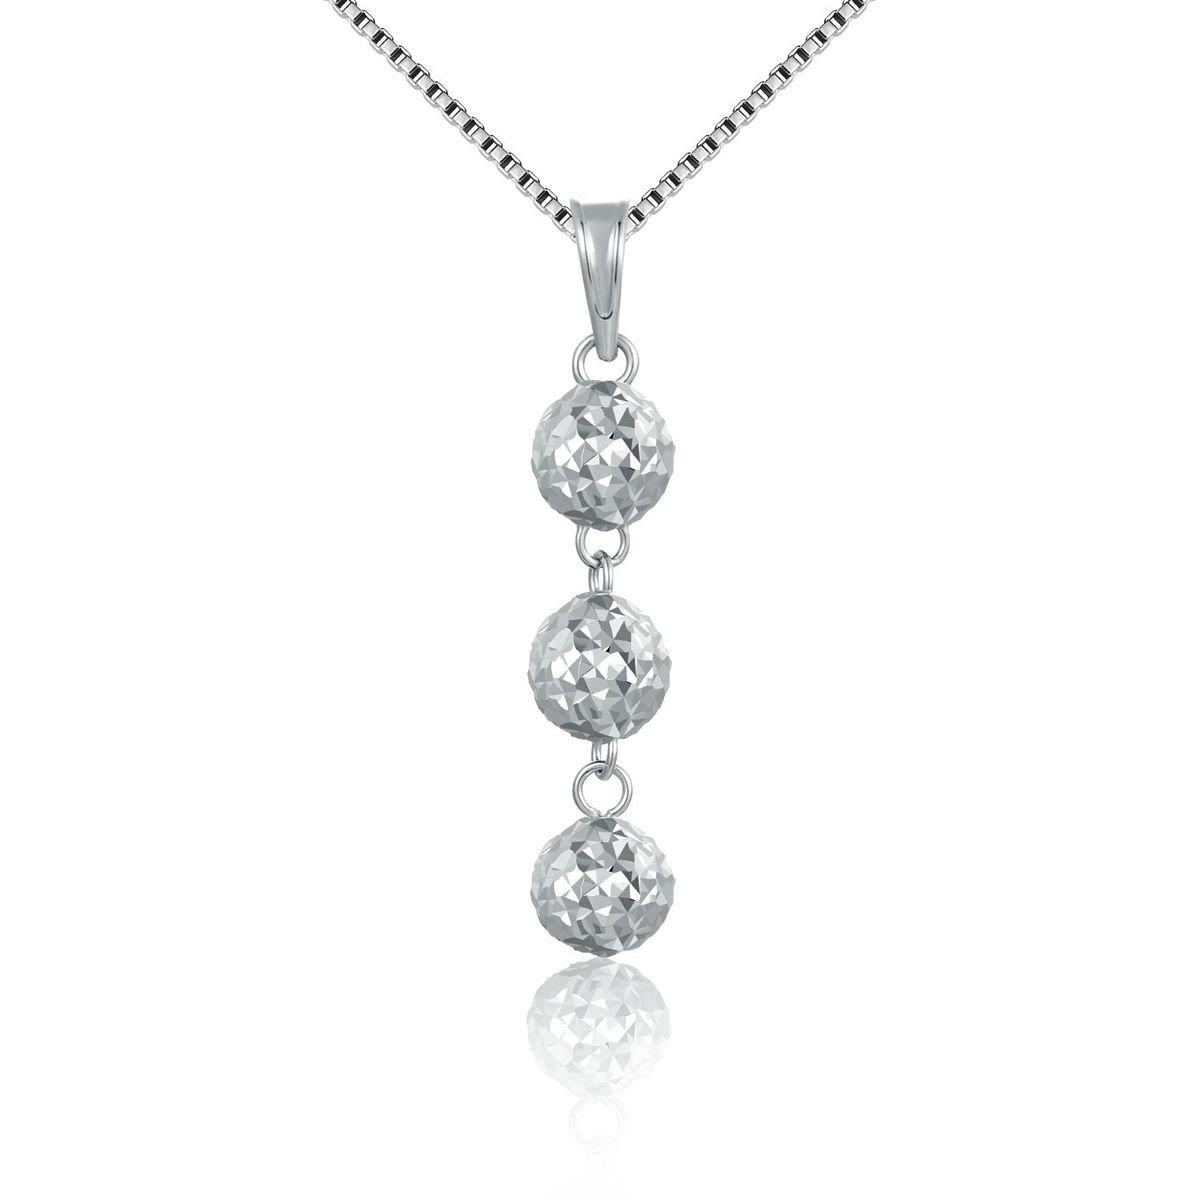 14K/585 白色黃金三顆圓珠項鍊